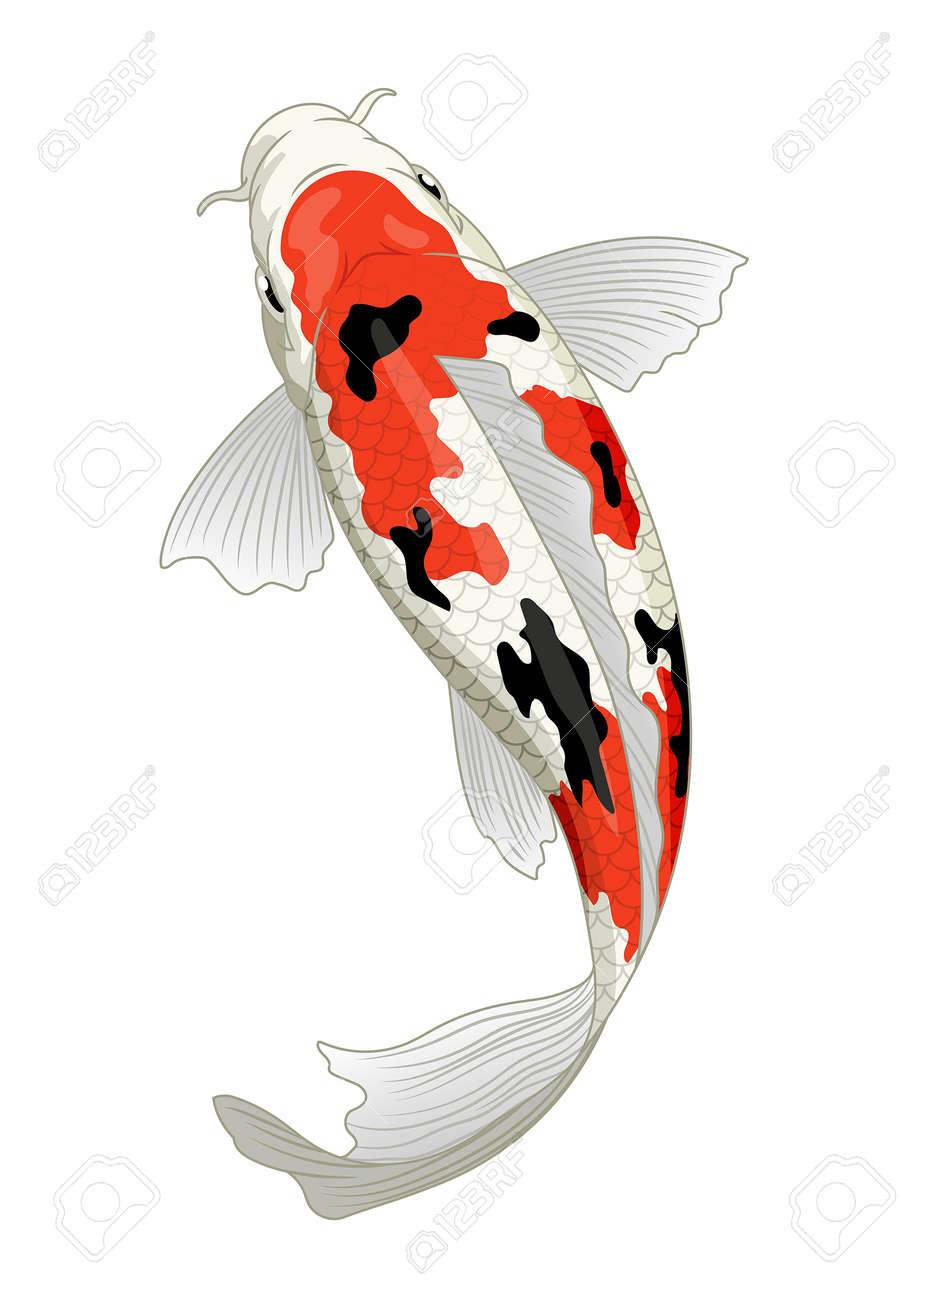 japan koi fish in sanke coloration - 163542992